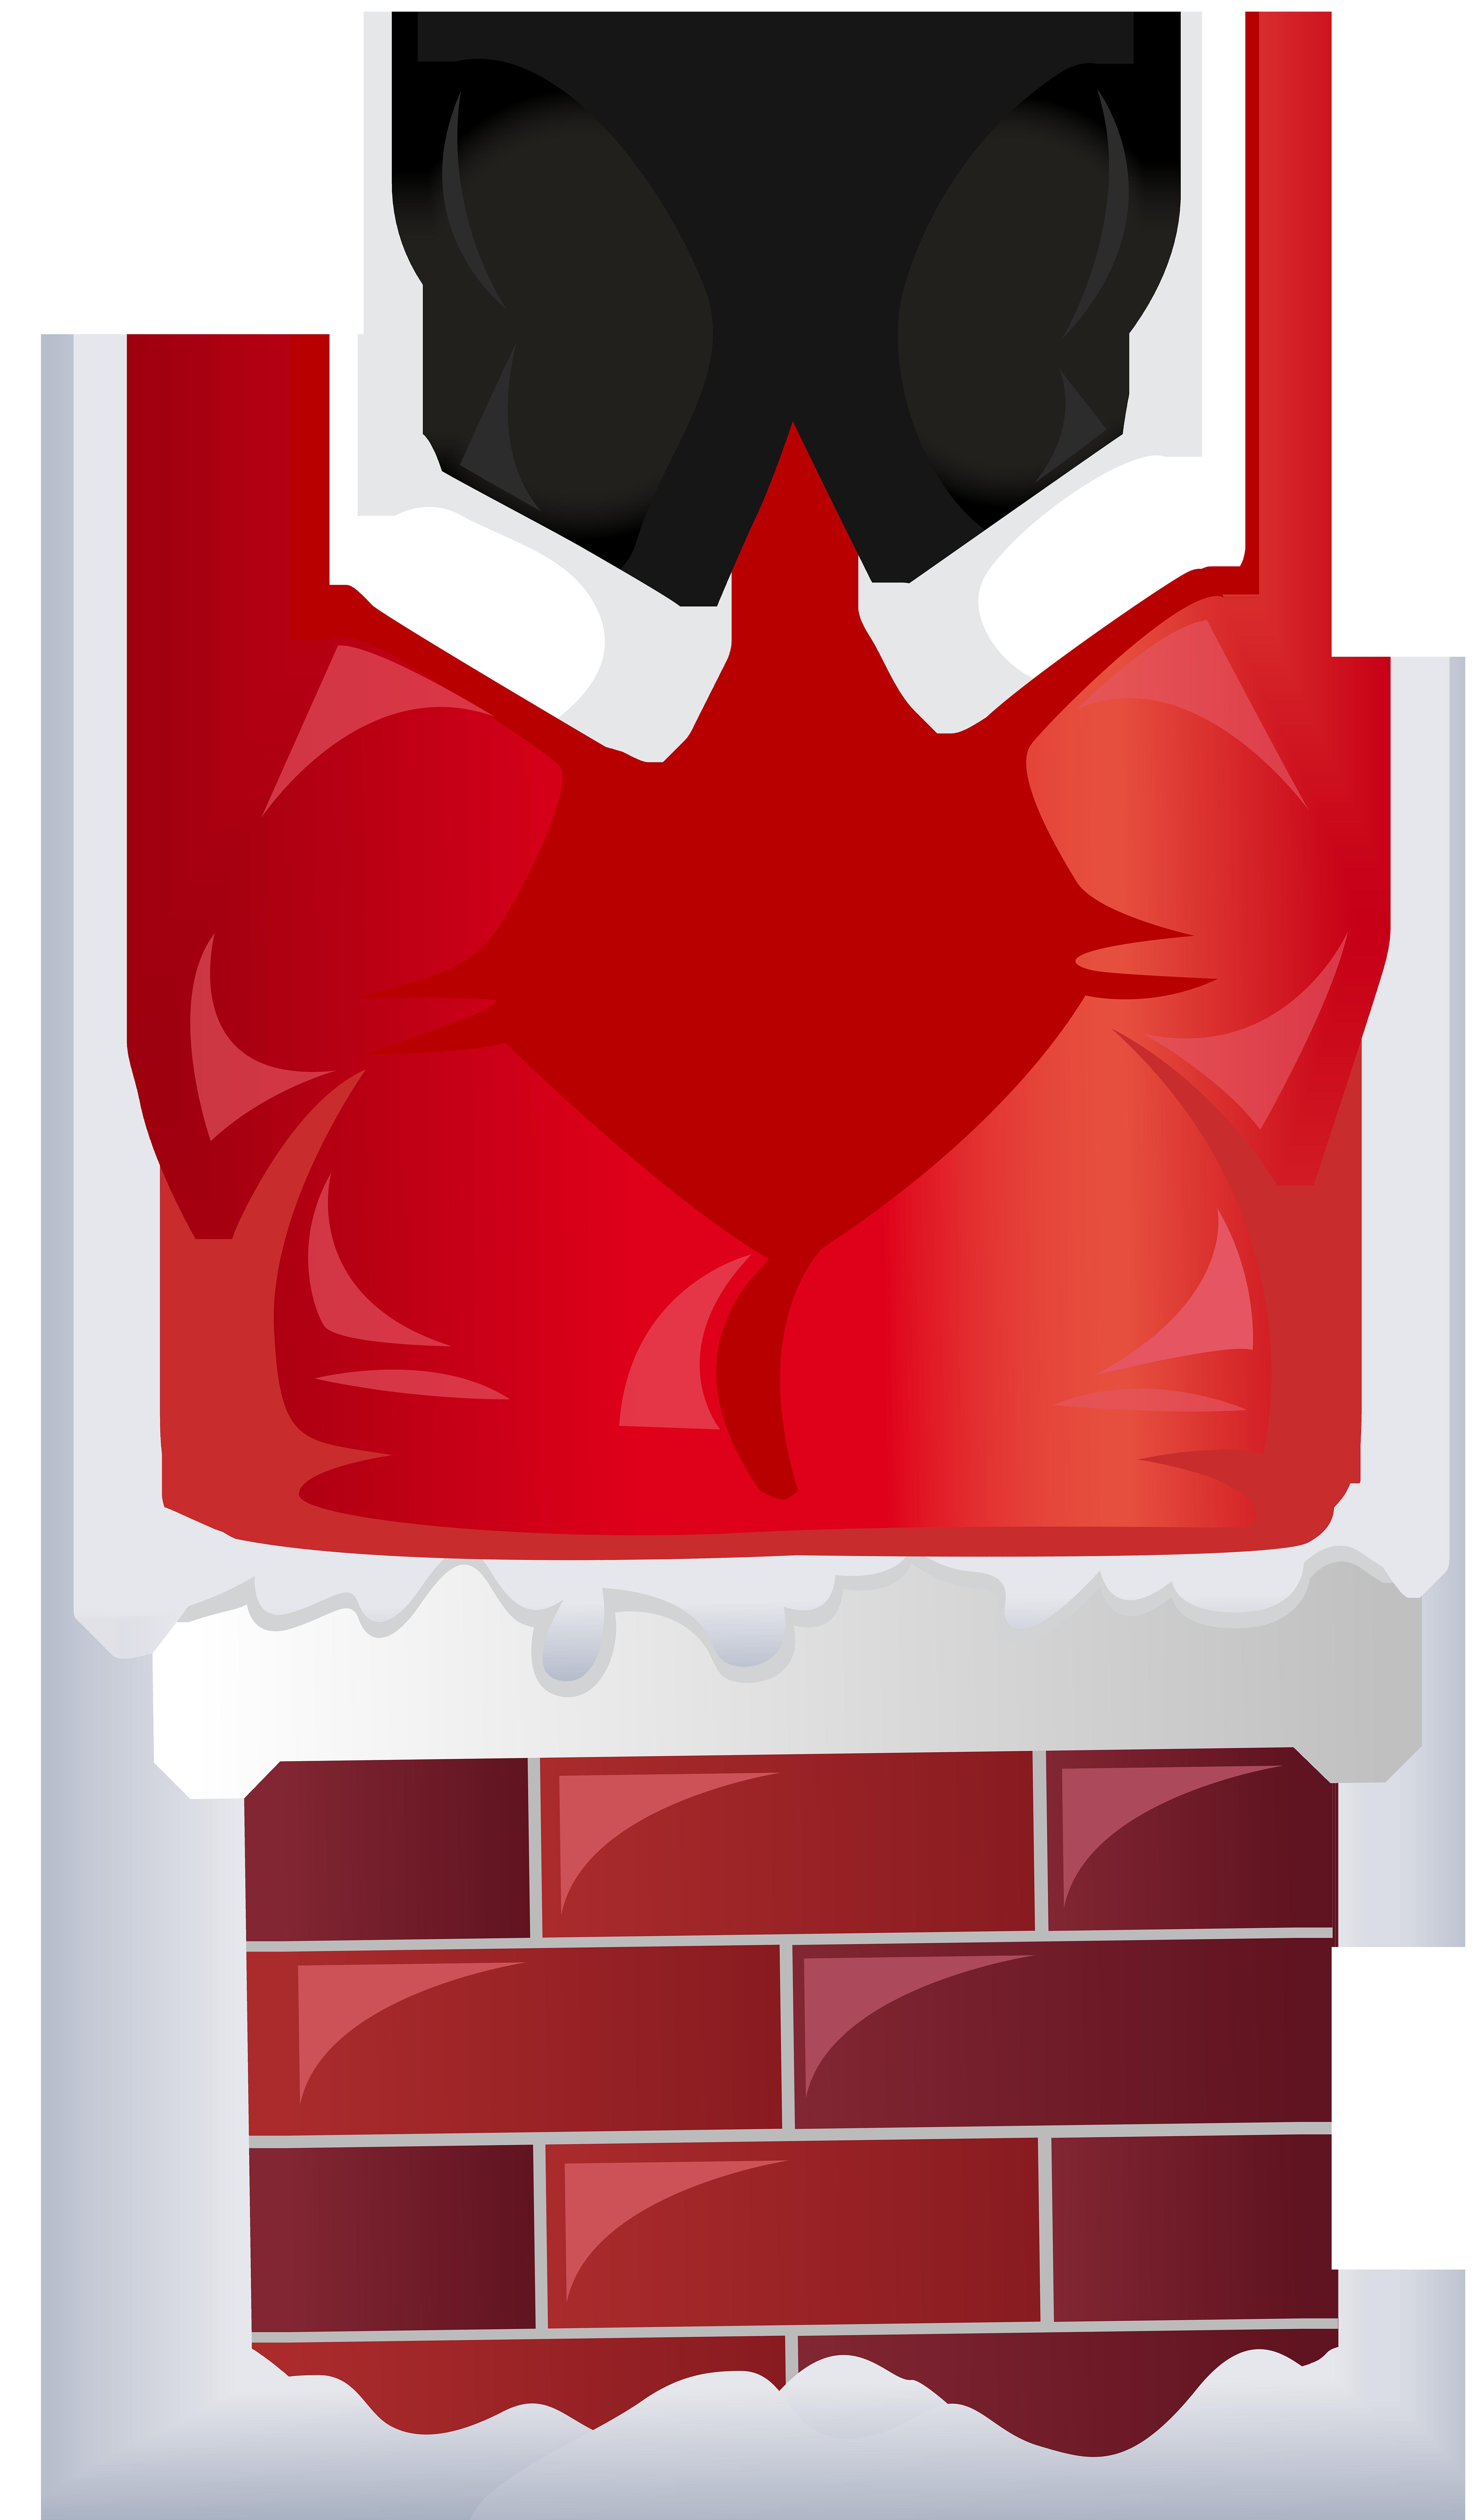 4681x8000 Funny Santa in Chimney Transparent PNG Clip Artu200b Gallery